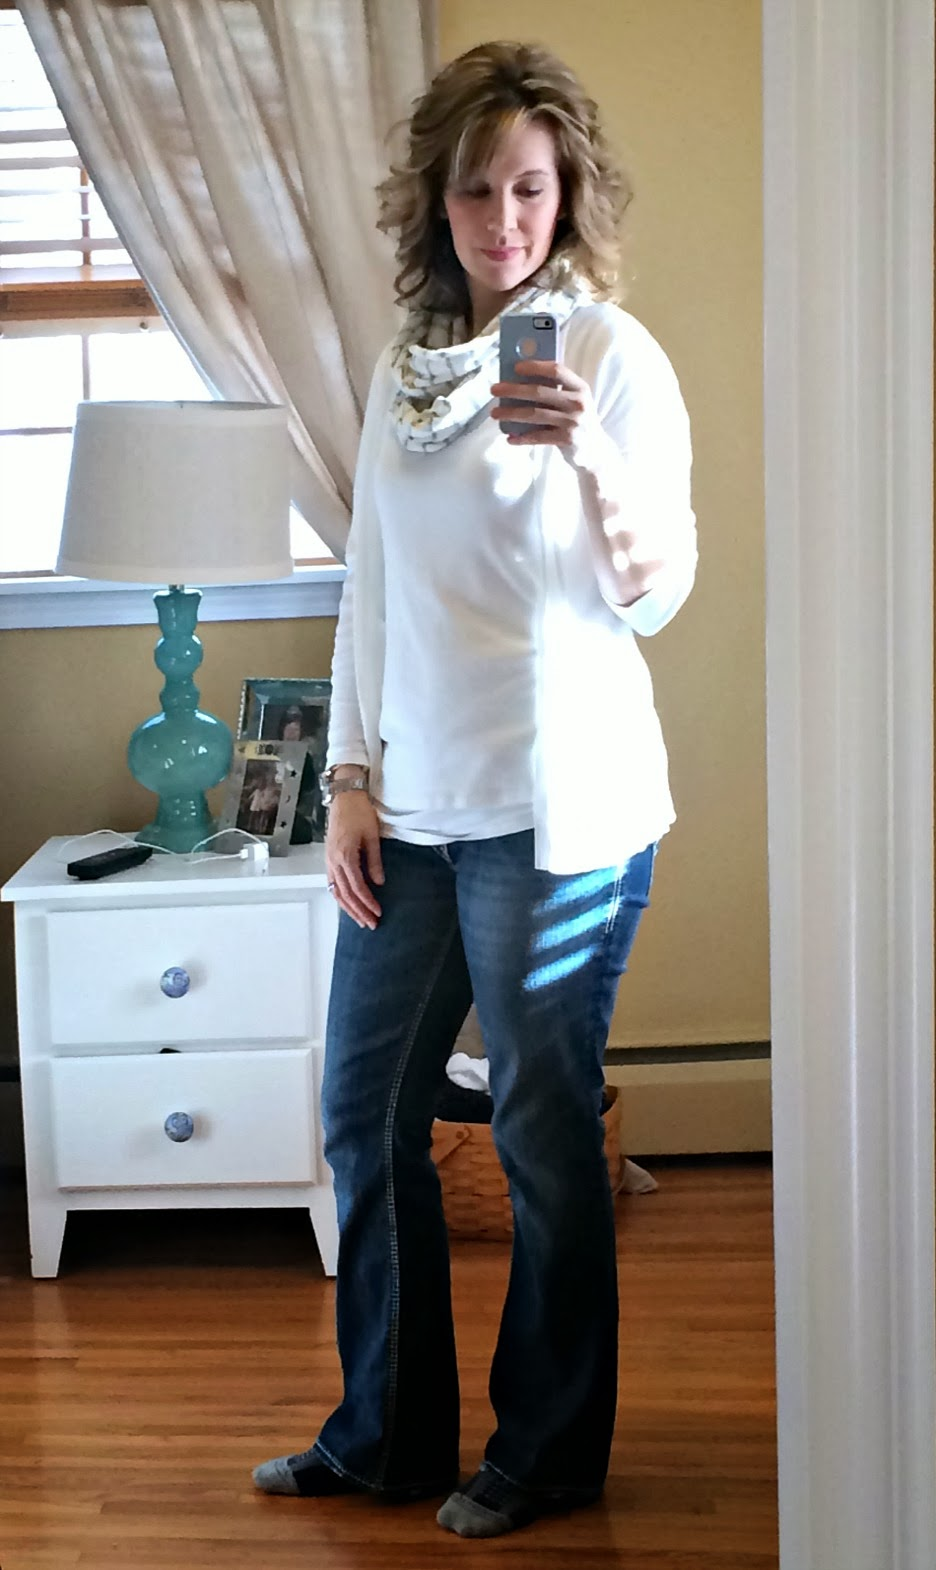 Uggs Yoga Pants North Face Jacket